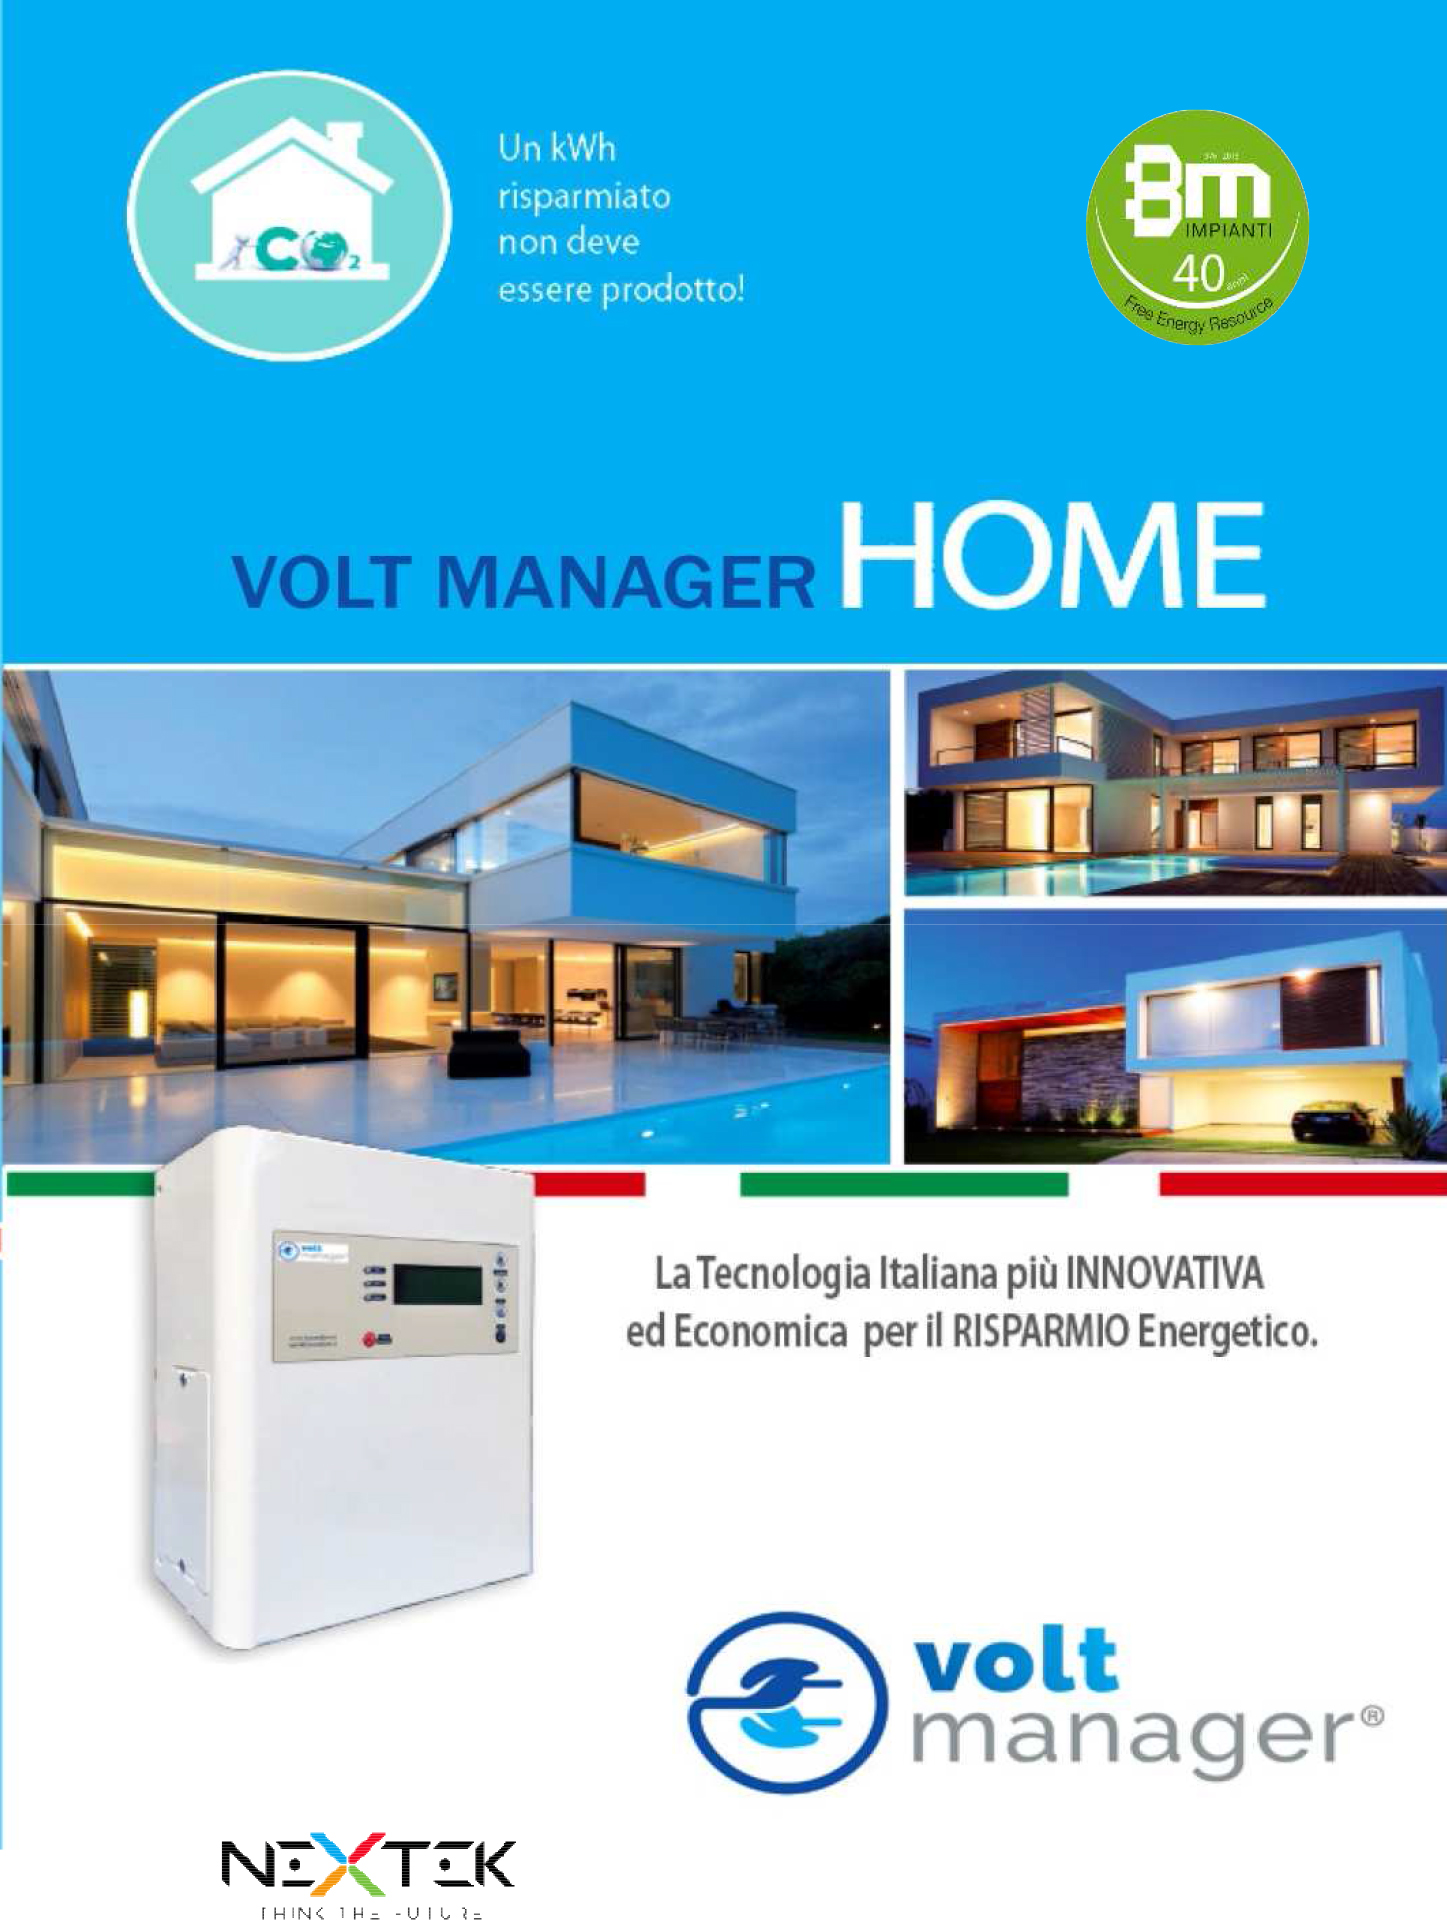 Depliant Volt Manager BM Impianti 2018 OK 1